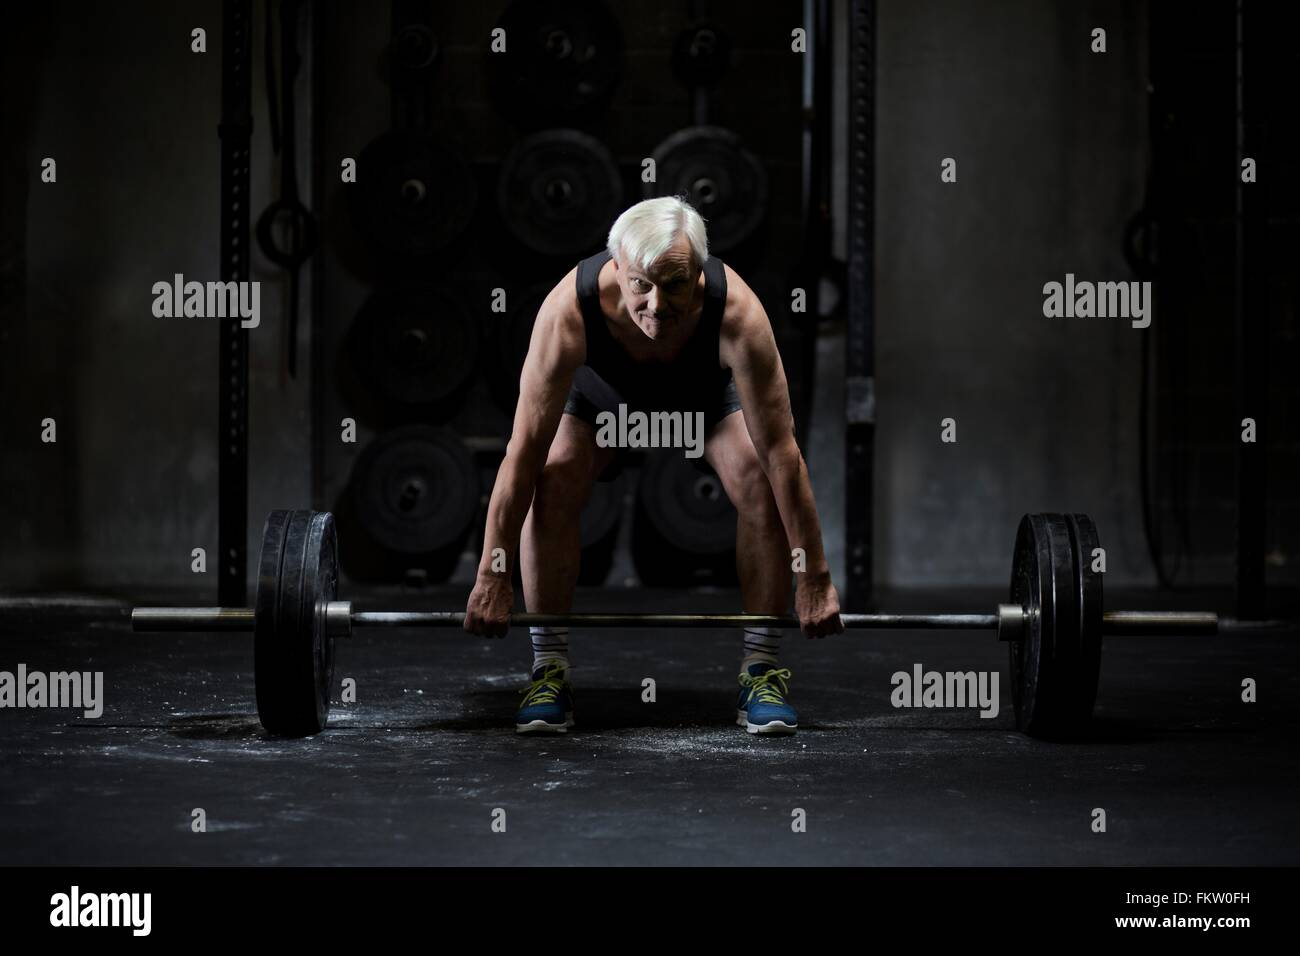 Senior man preparing to weightlift barbell in dark gym - Stock Image